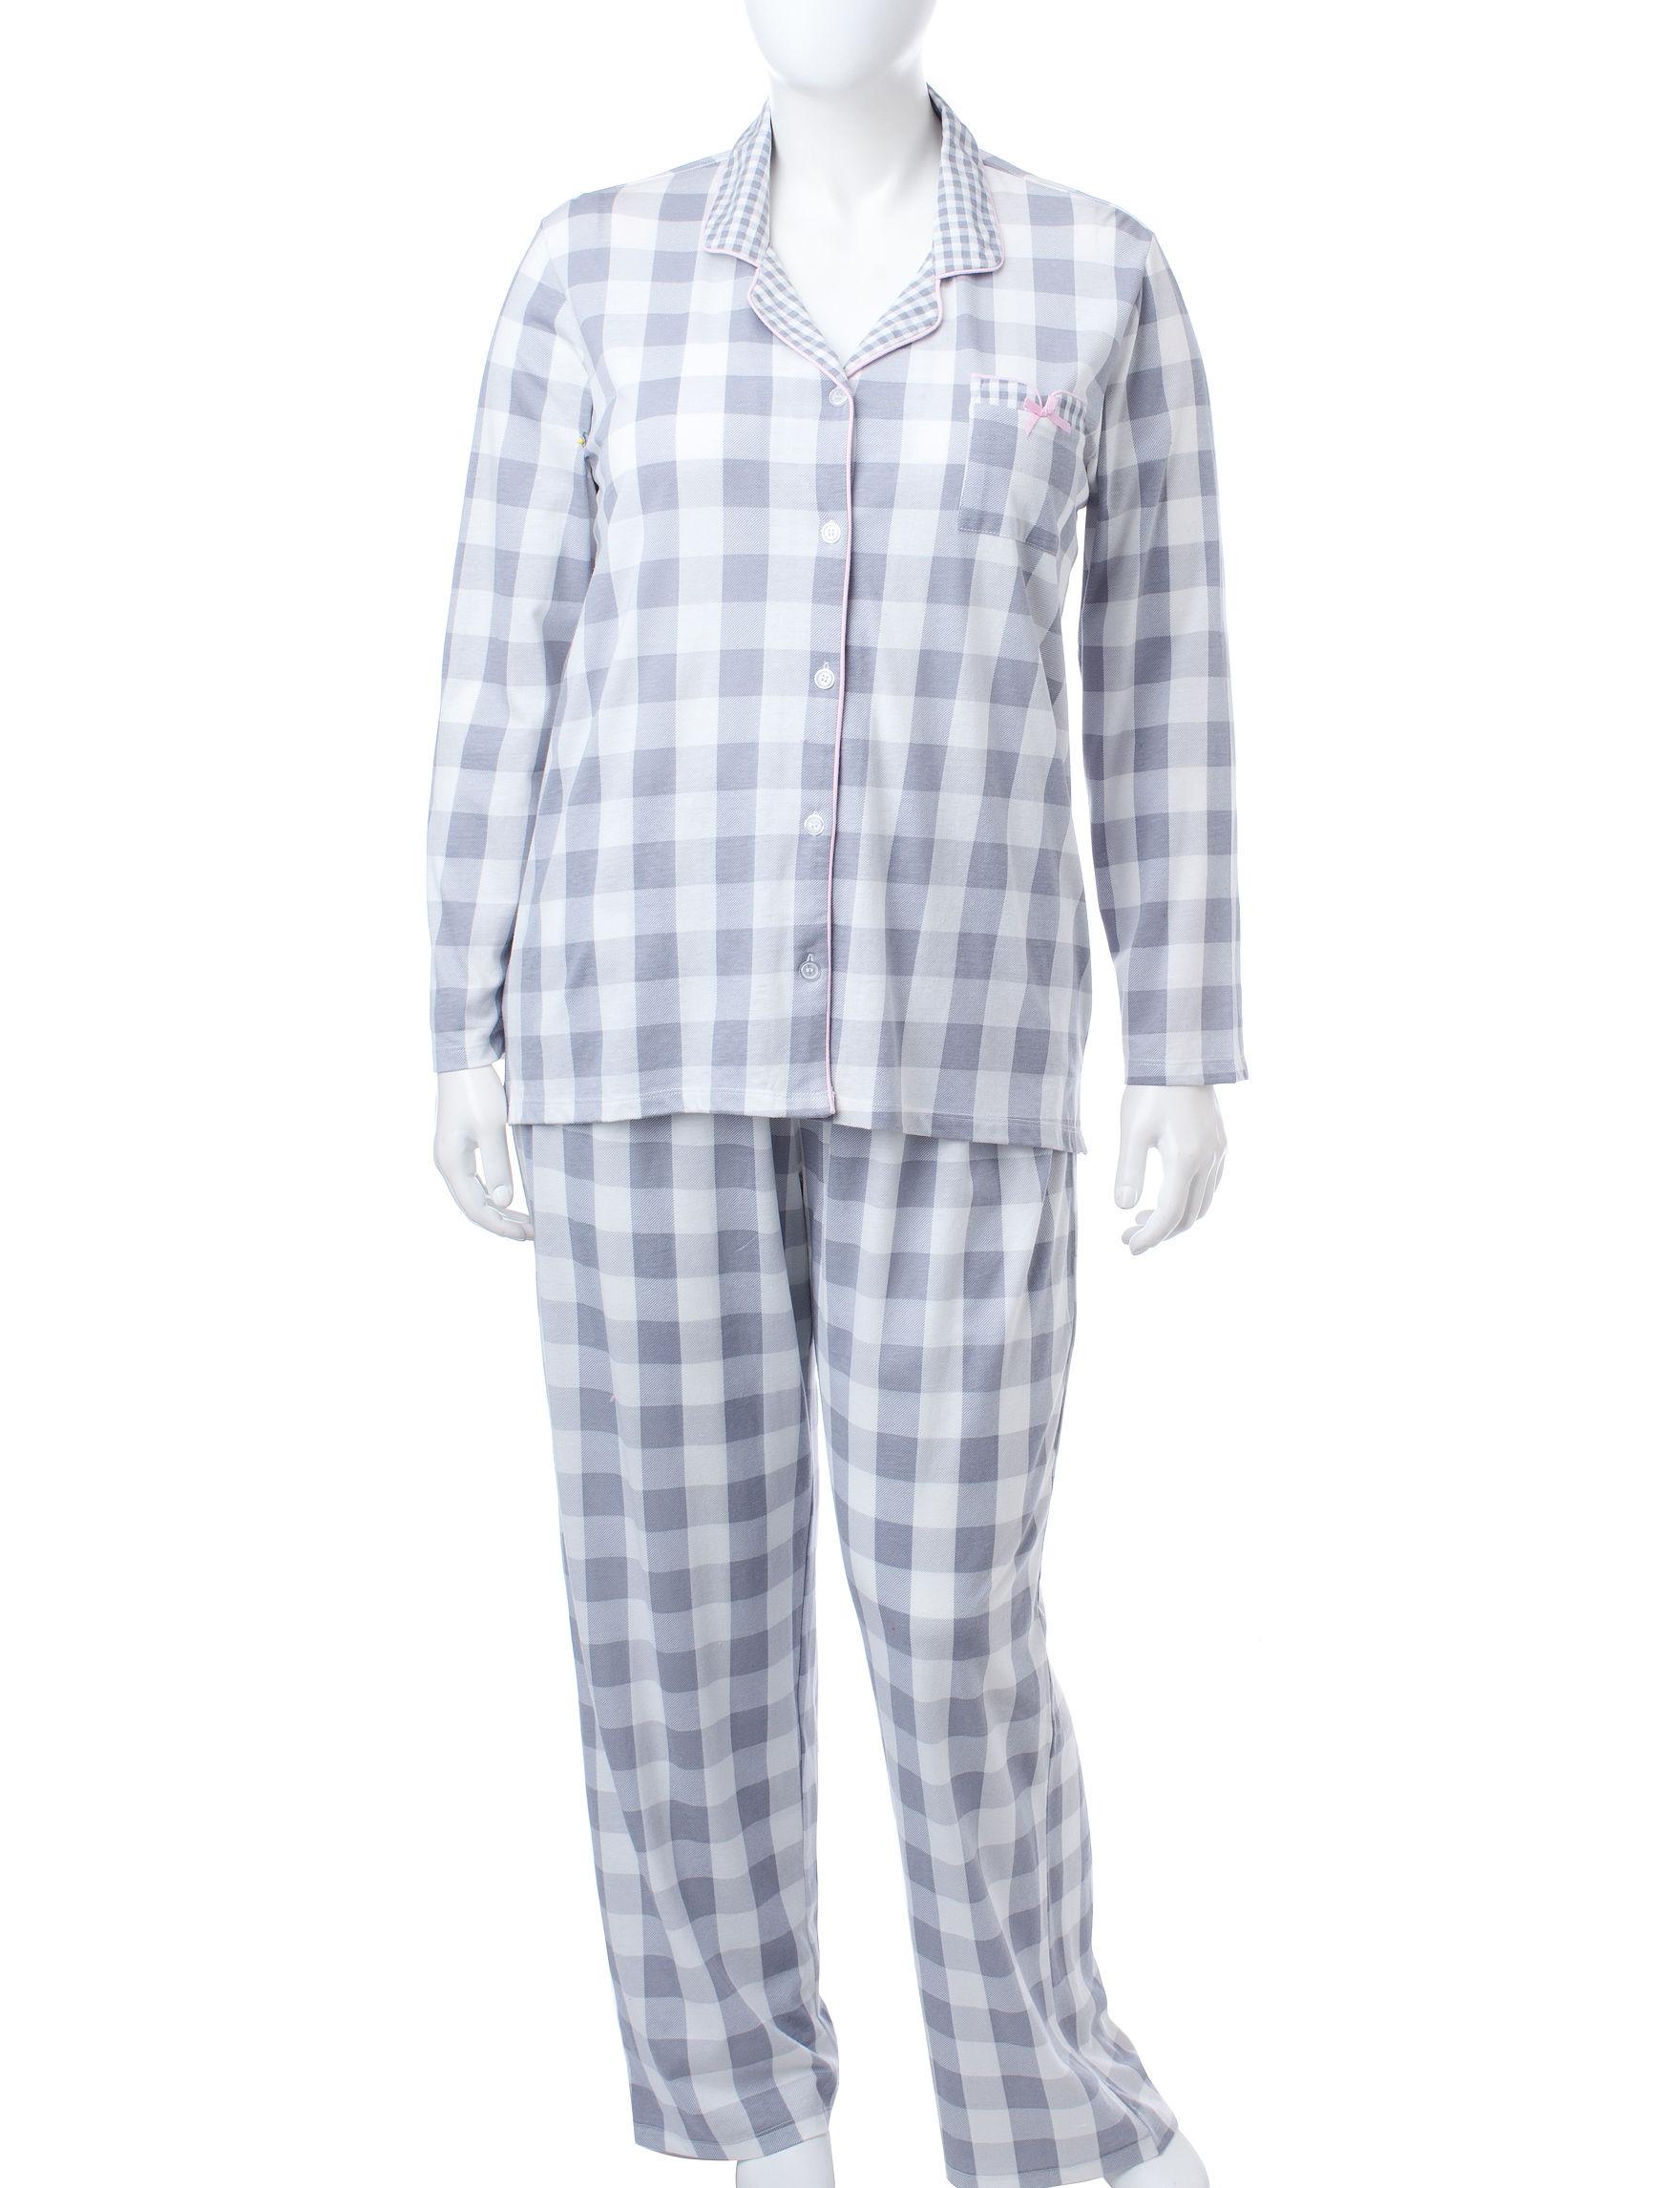 Laura Ashley Grey Multi Pajama Sets